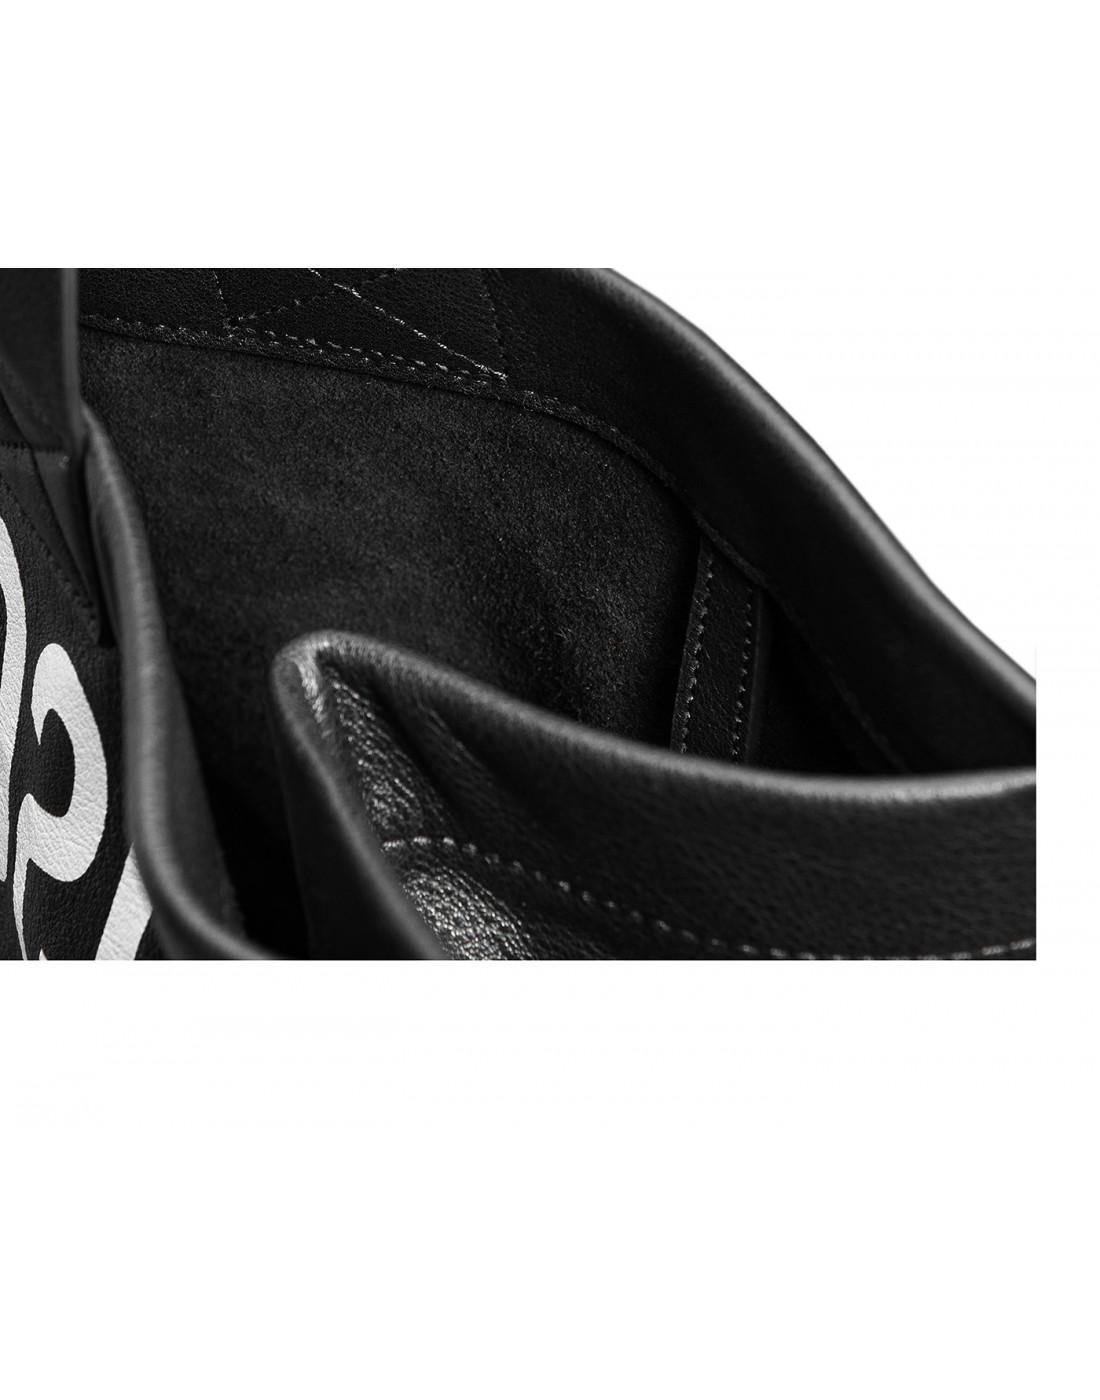 Сумка-шопер черная женская Dsquared2 SSPW0022.M063-5